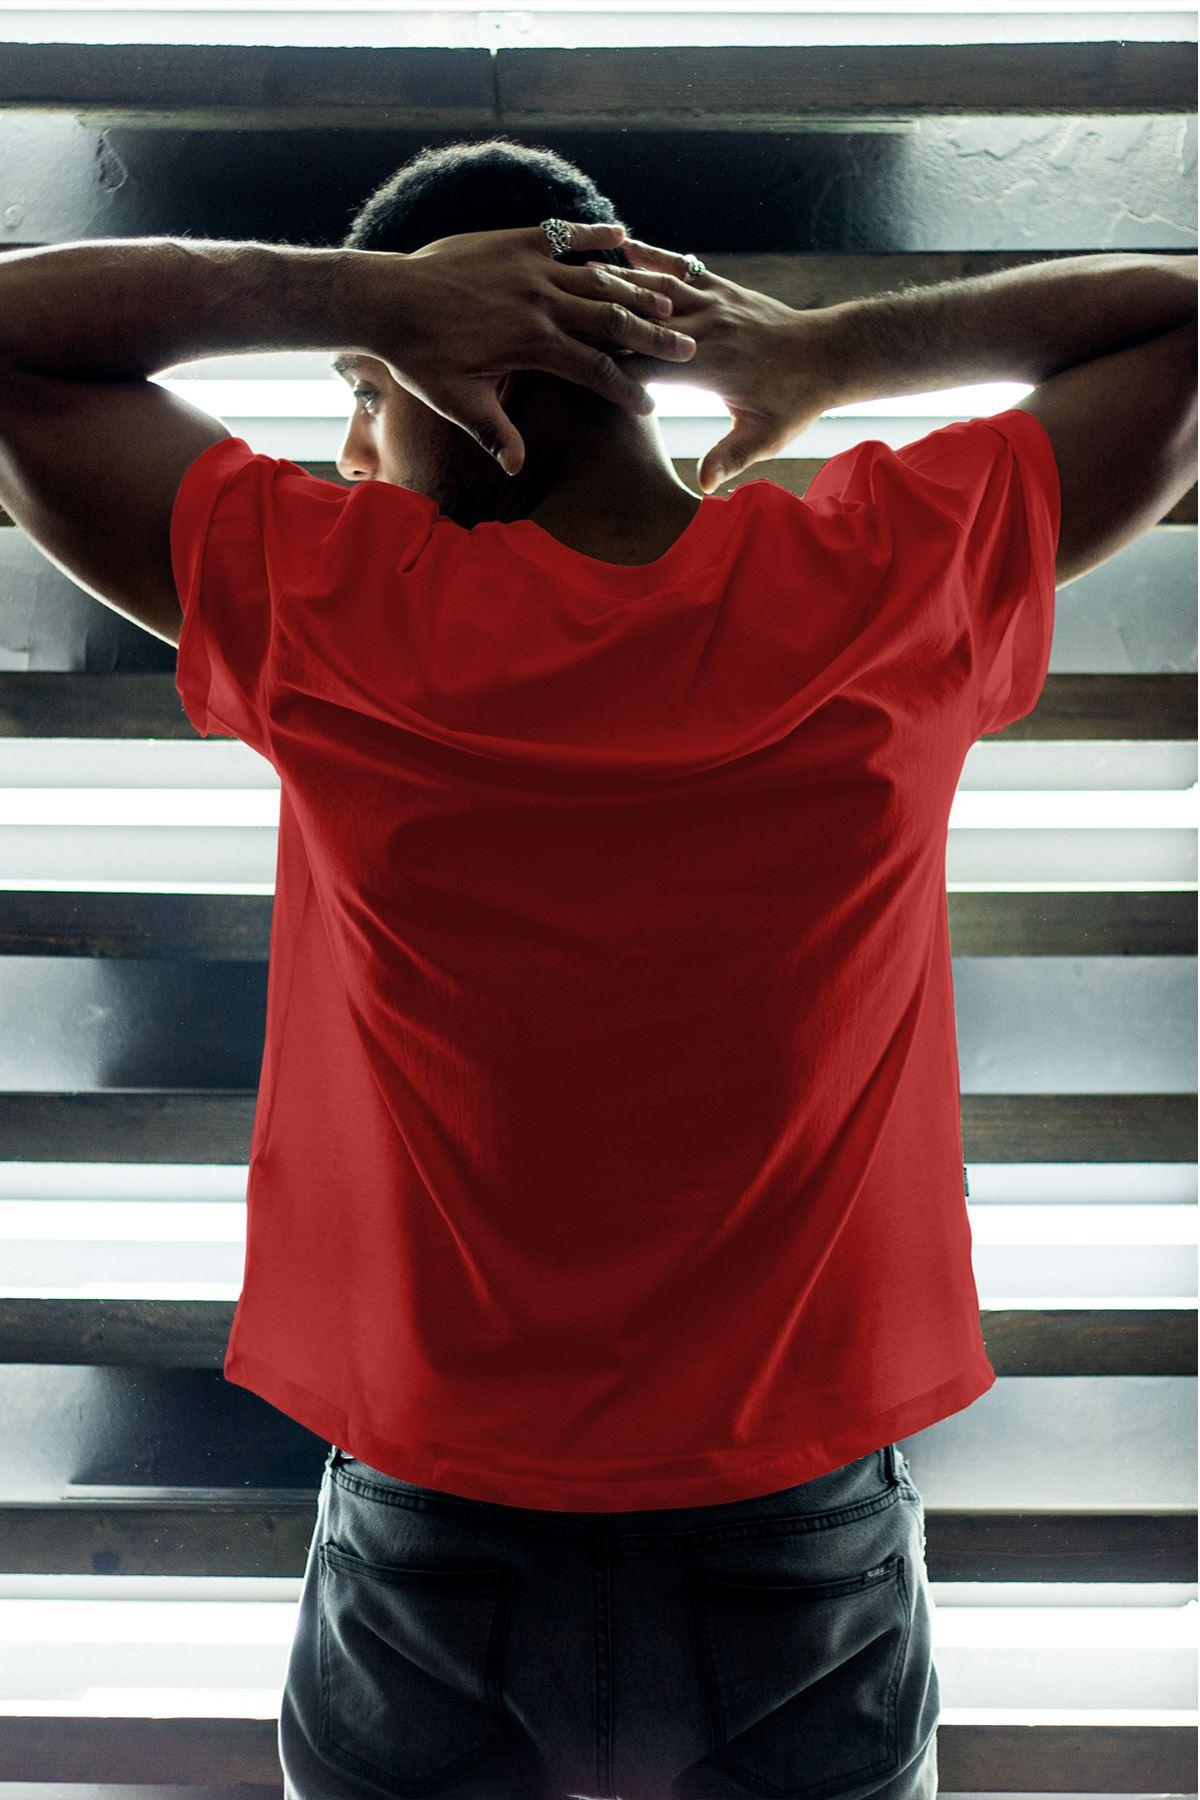 Harry Potter 59 Kırmızı Erkek Oversize Tshirt - Tişört